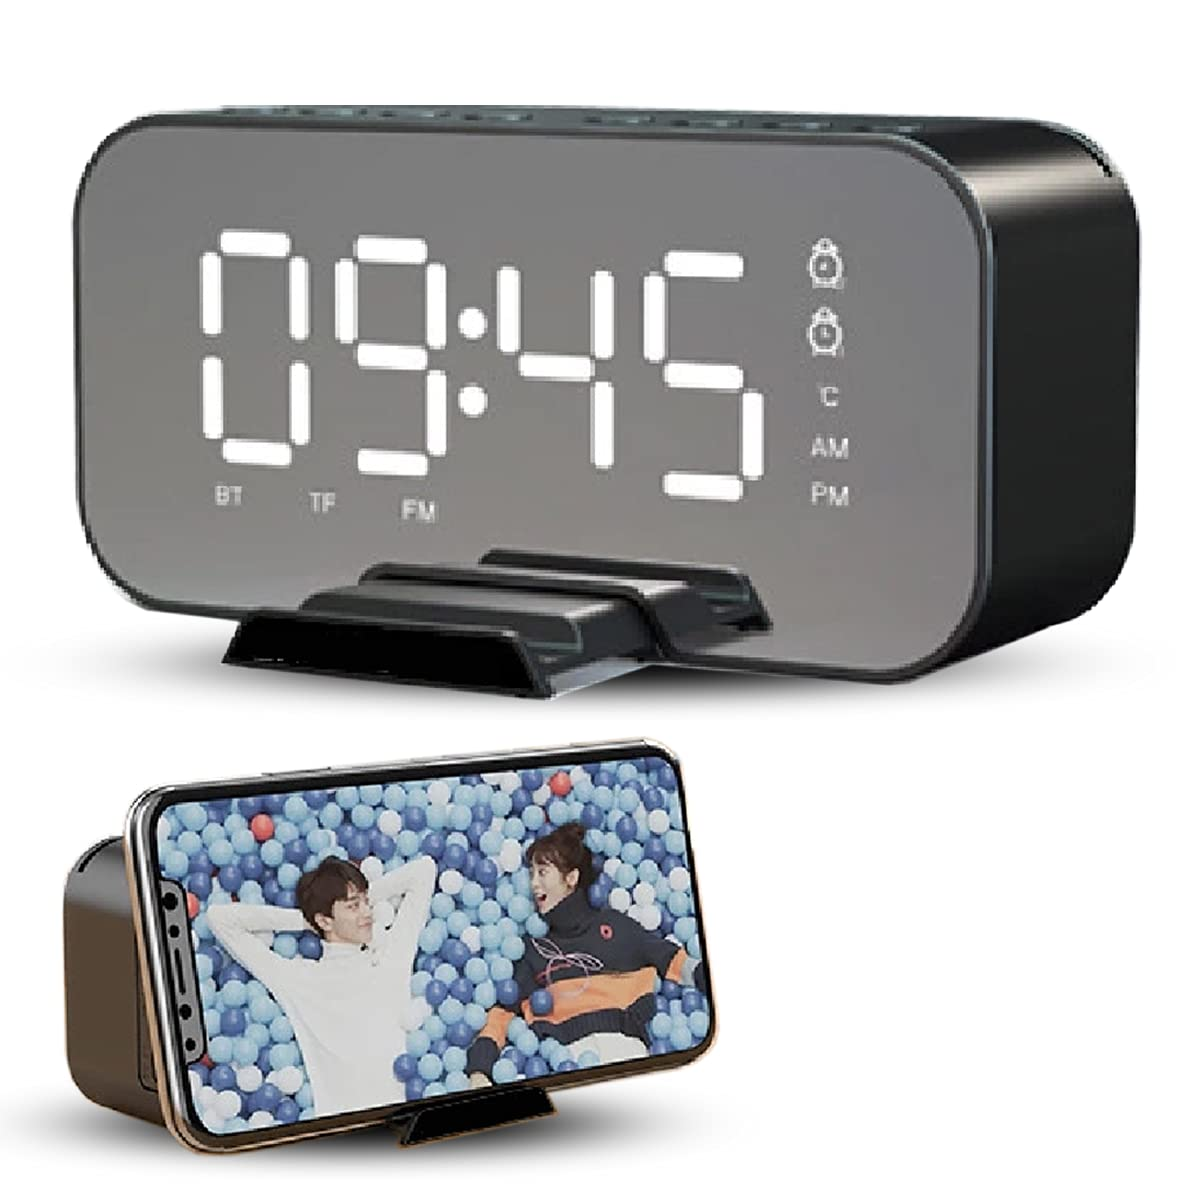 Best Digital Table Clock with Alarm